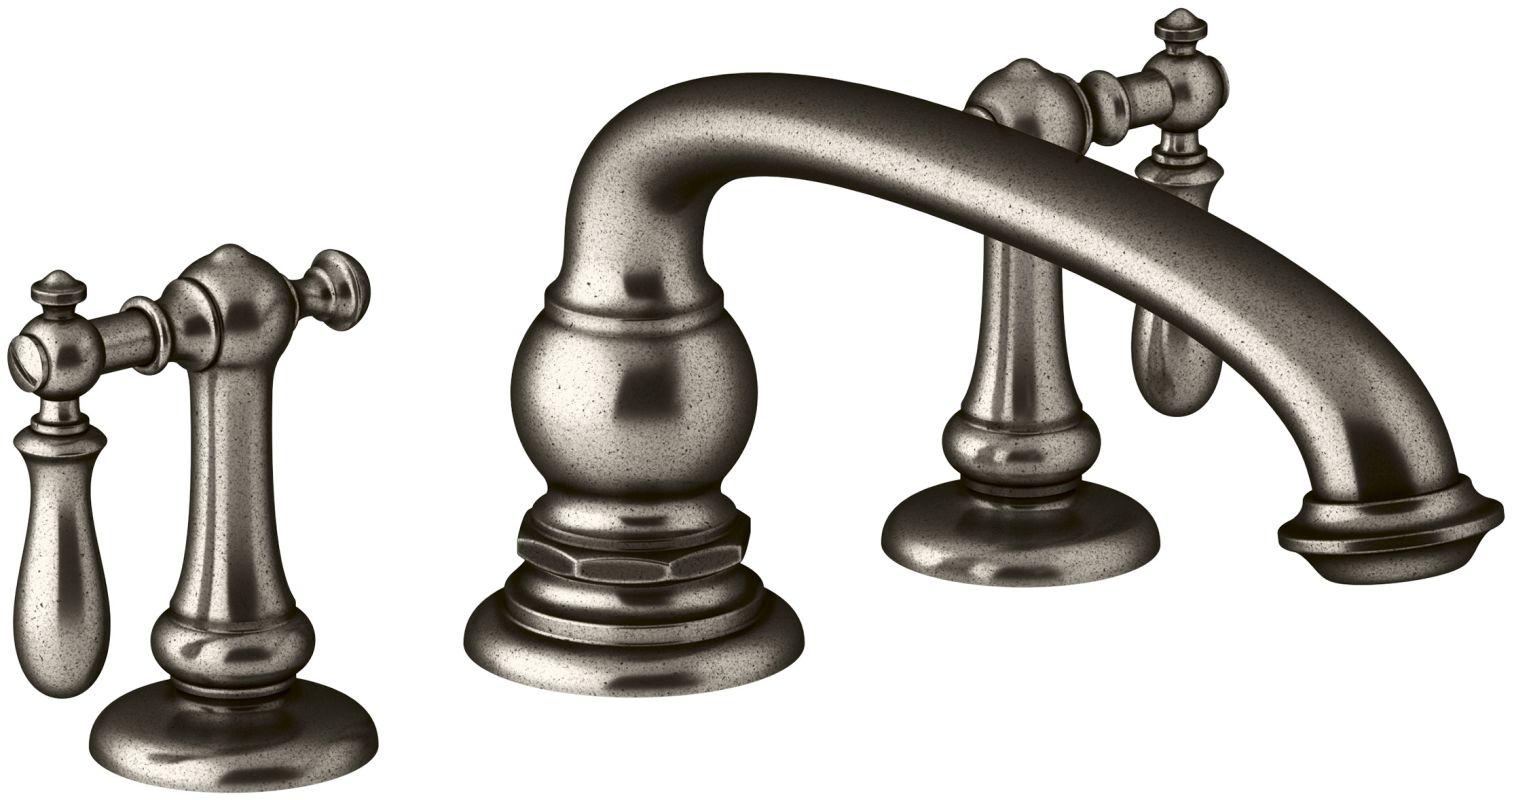 Kohler K T72778 9M CP Polished Chrome Artifacts Deck Mounted Roman Tub Faucet